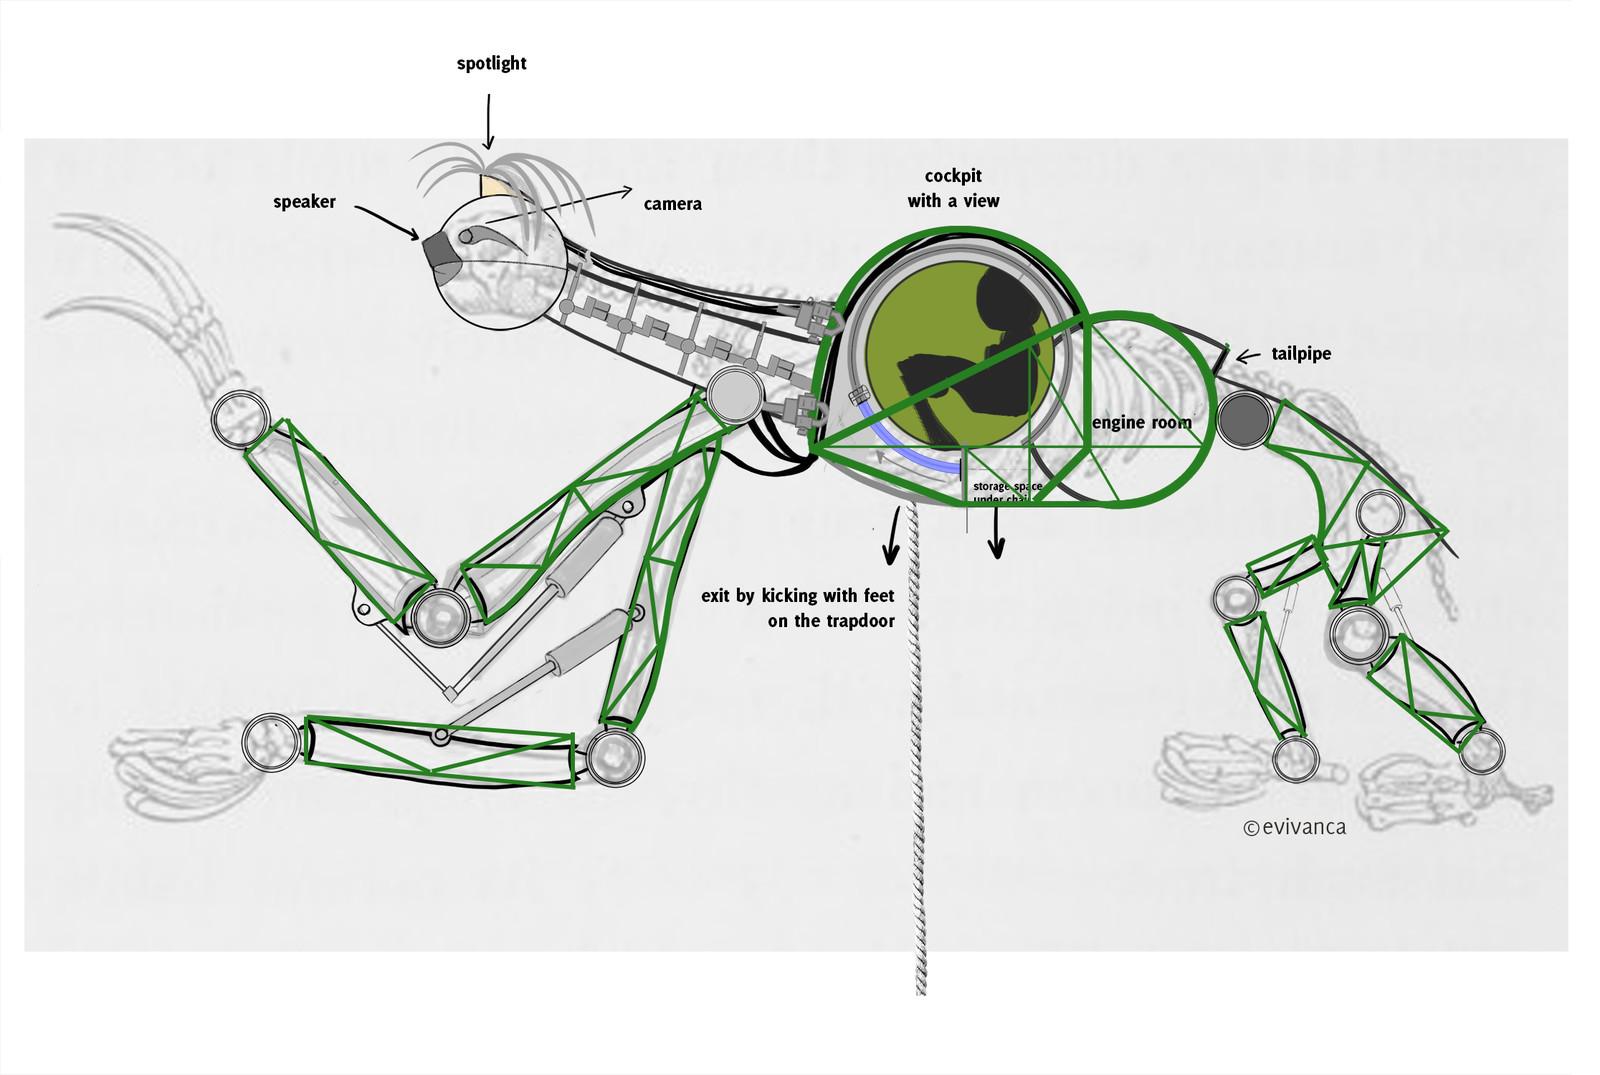 Bertil Bretel's custom-made vehicle - How it works